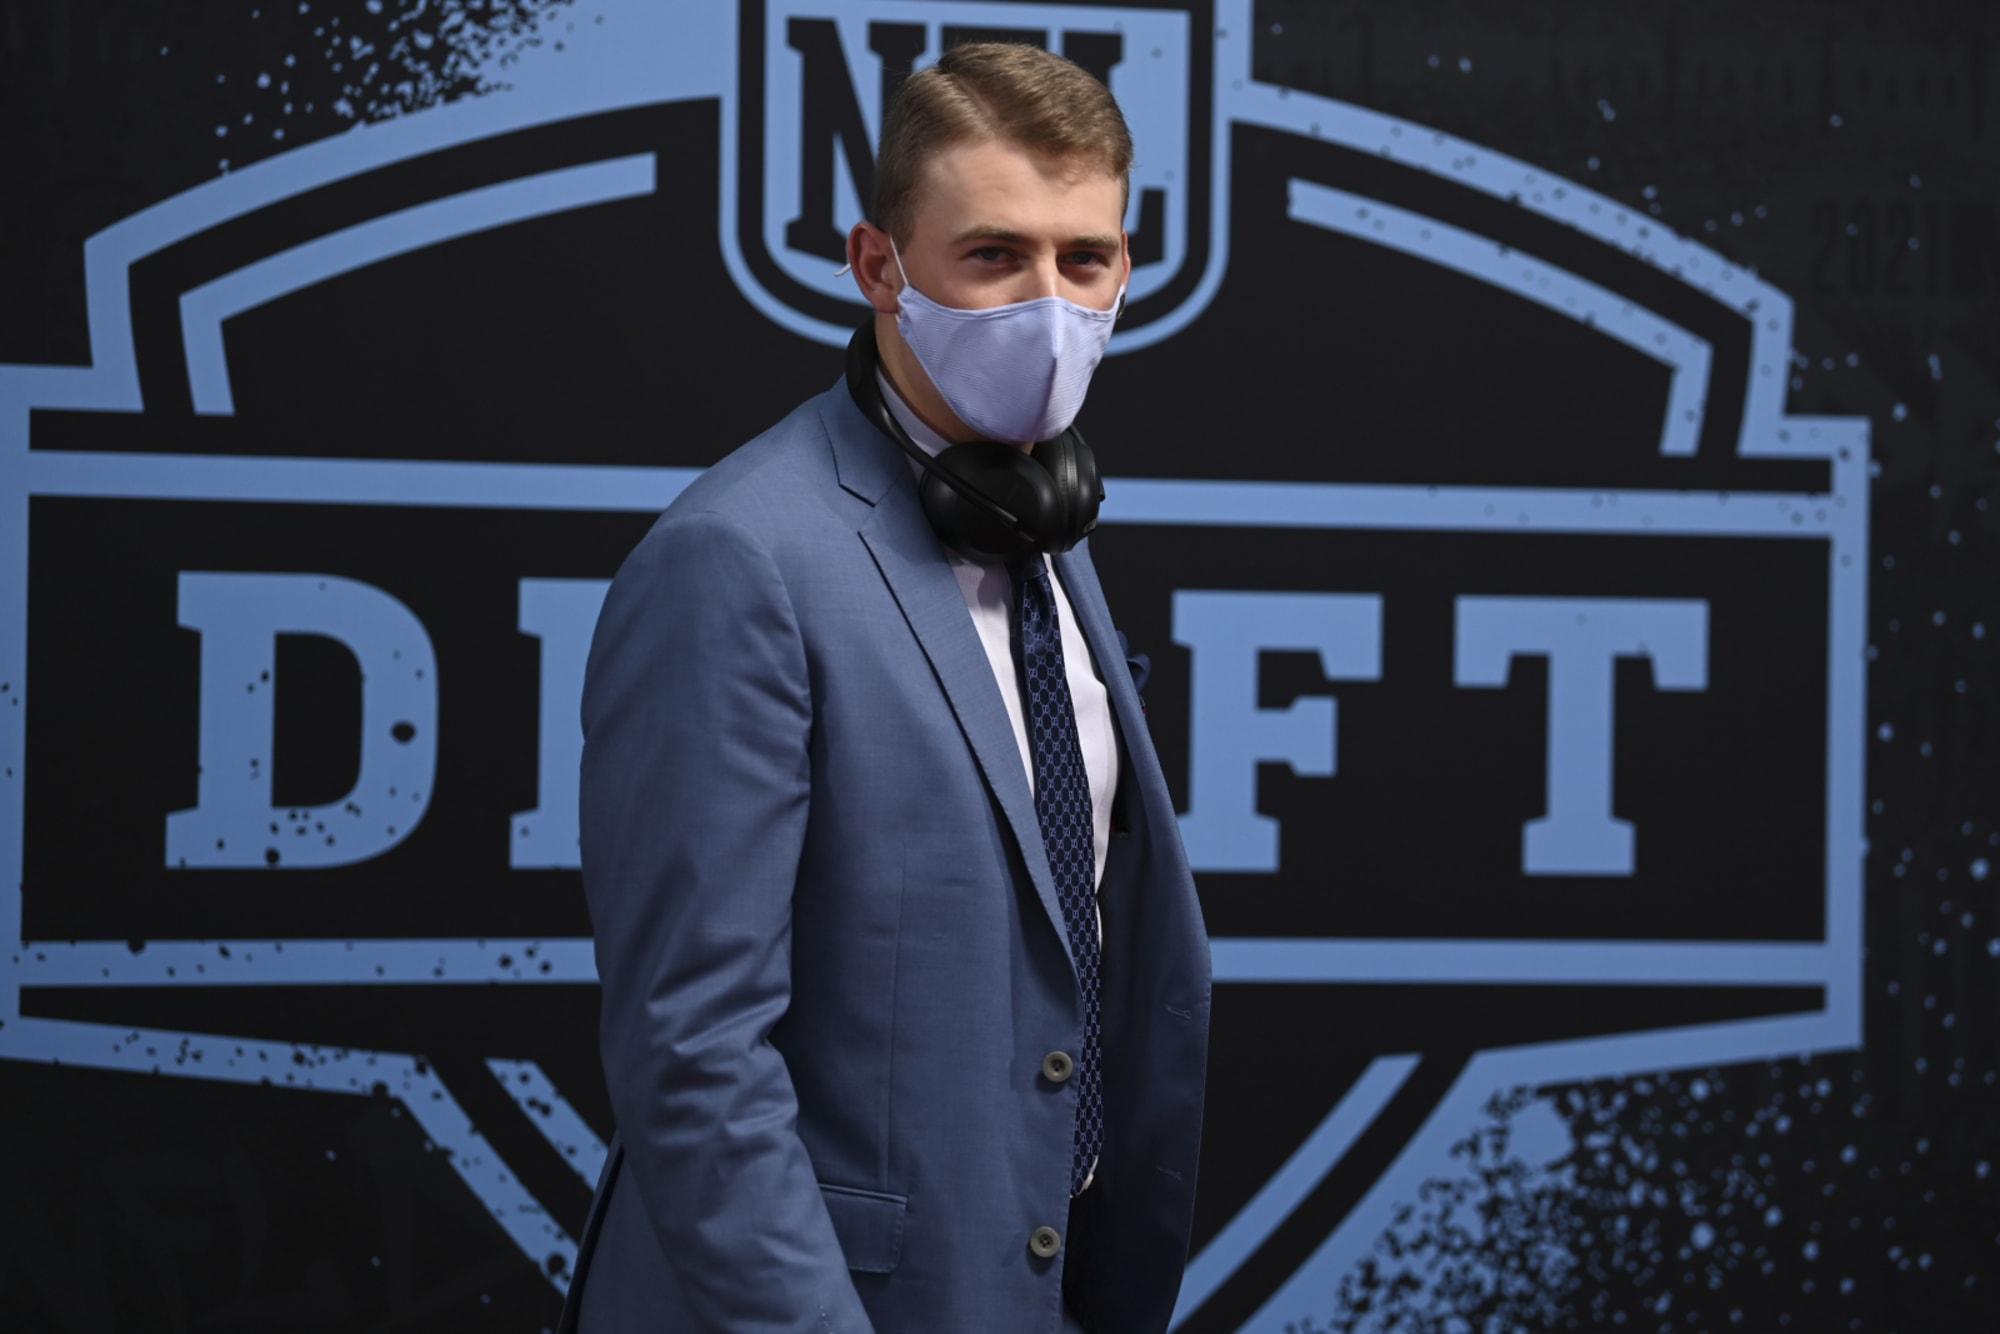 Auburn football fans react to Patriots' first photos of Mac Jones